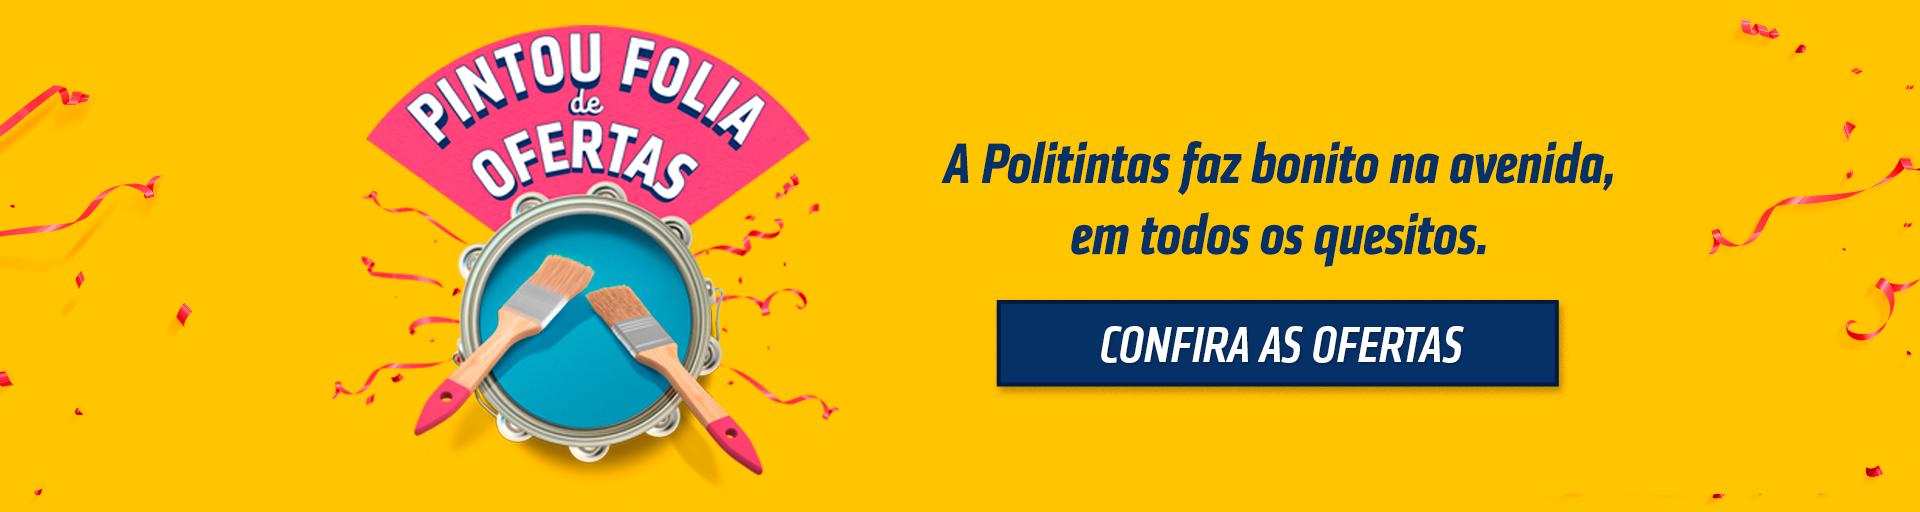 Banner-Fevereiro-2020